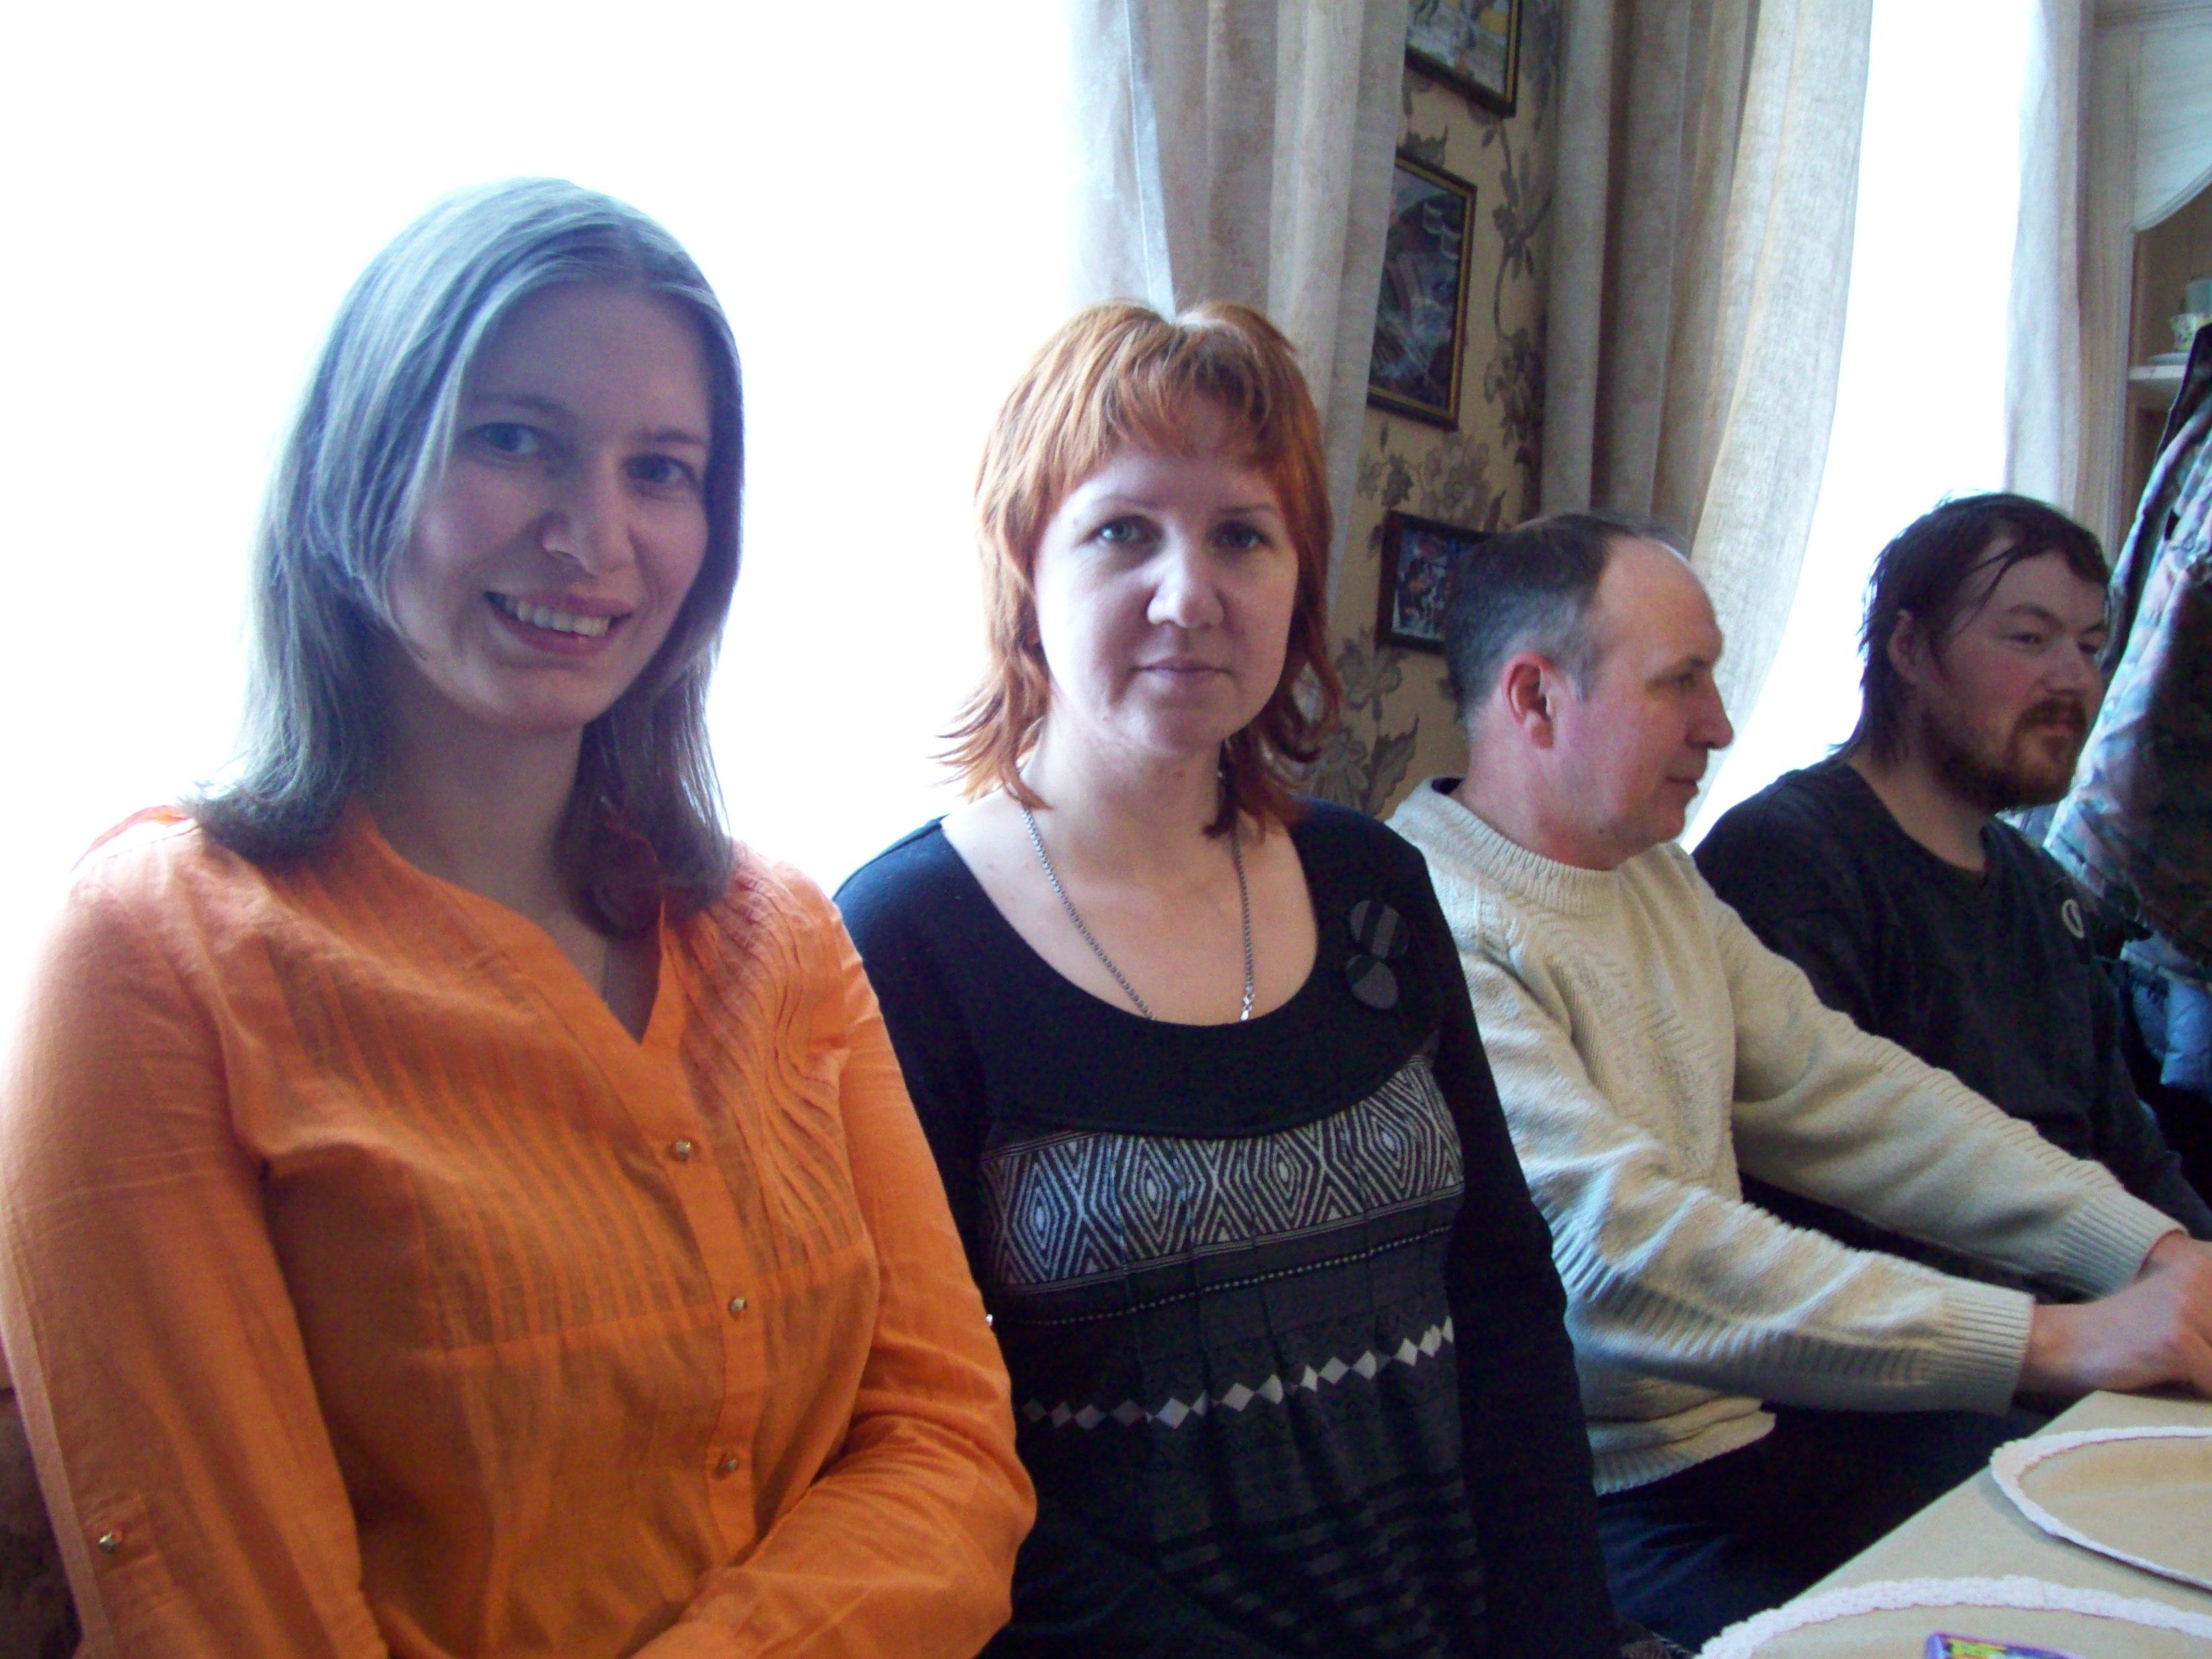 https://img-fotki.yandex.ru/get/69324/272497597.2e/0_323507_43b307e4_orig.jpg